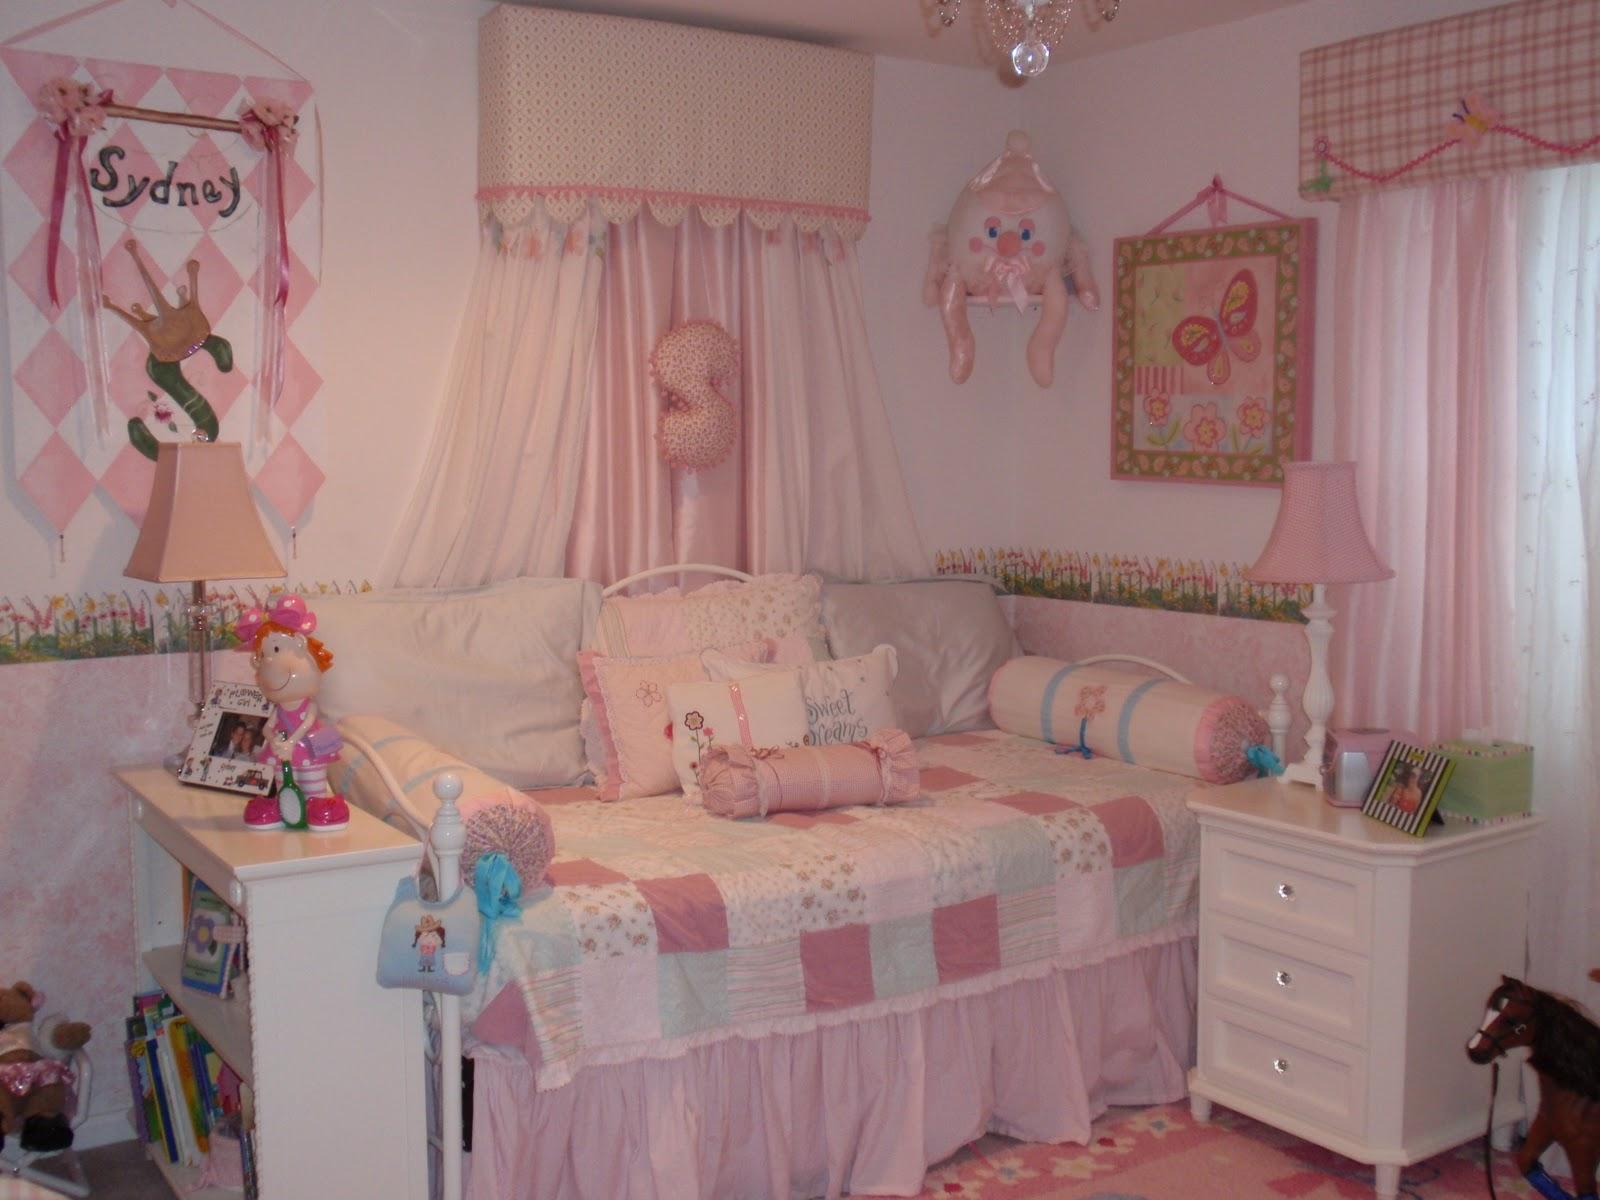 Diy By Design My Daughter 39 S Room The Big Reveal Repost